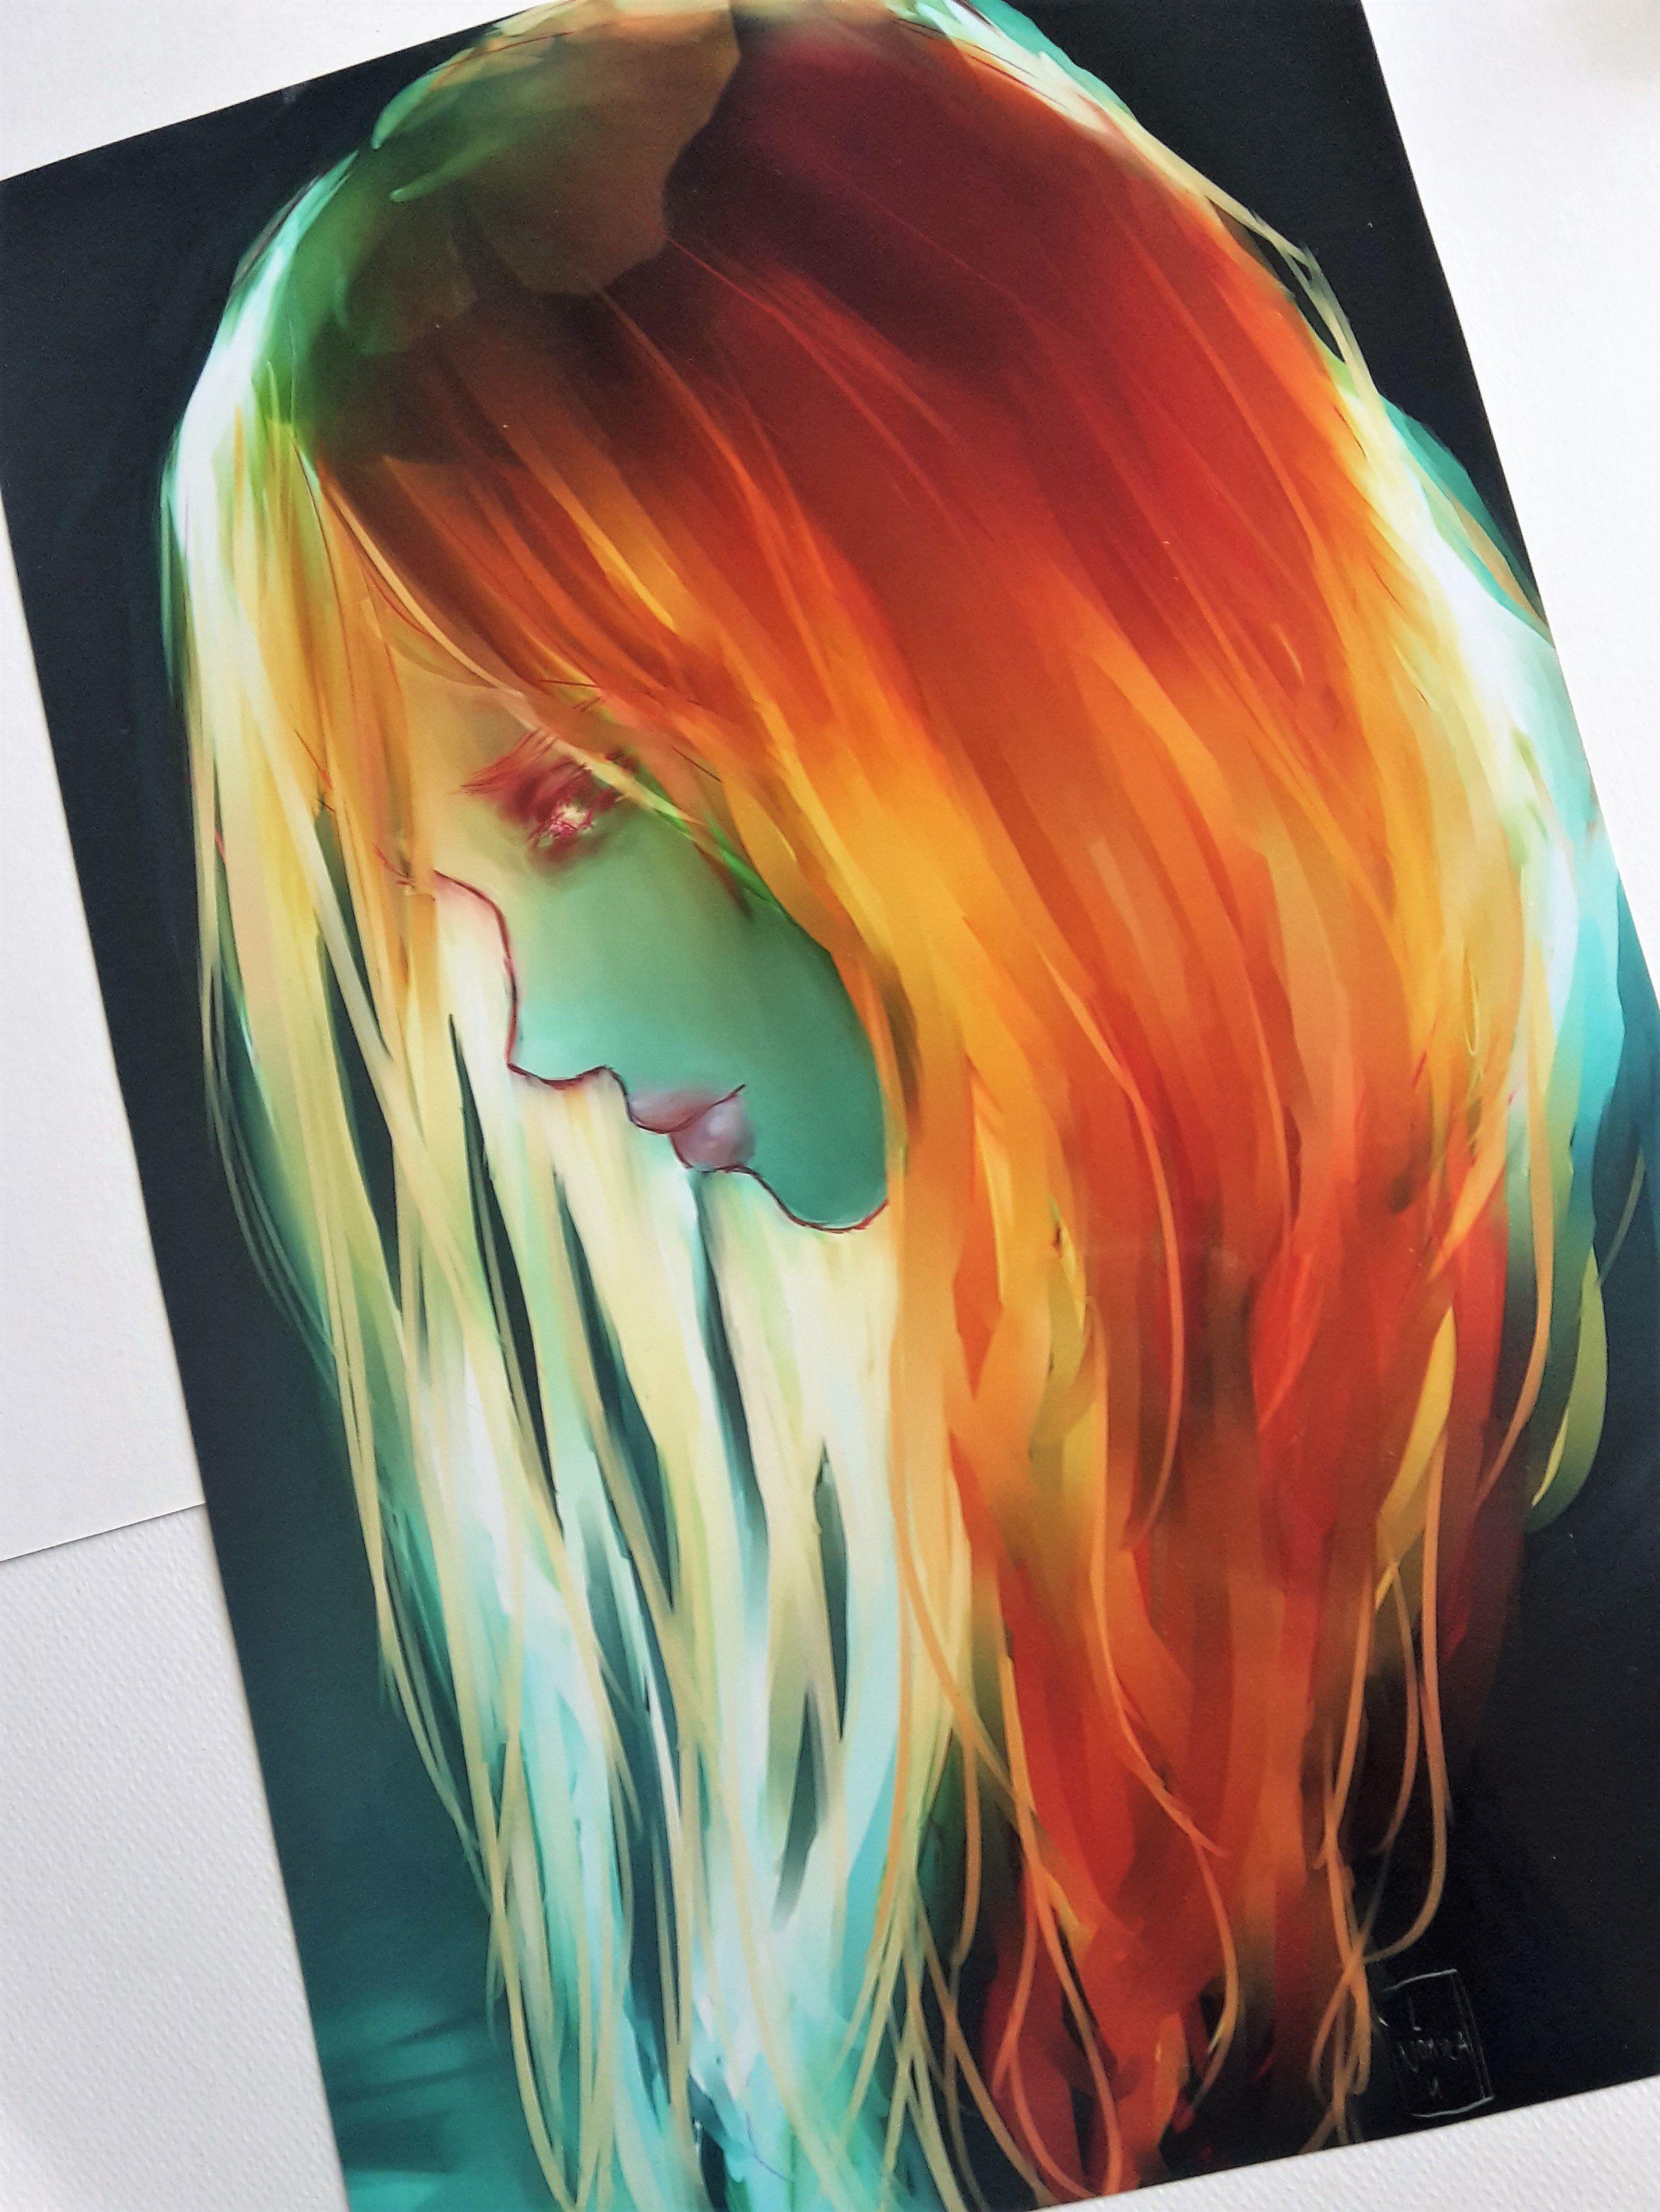 earth girl beautiful artist light print digitalart calm art